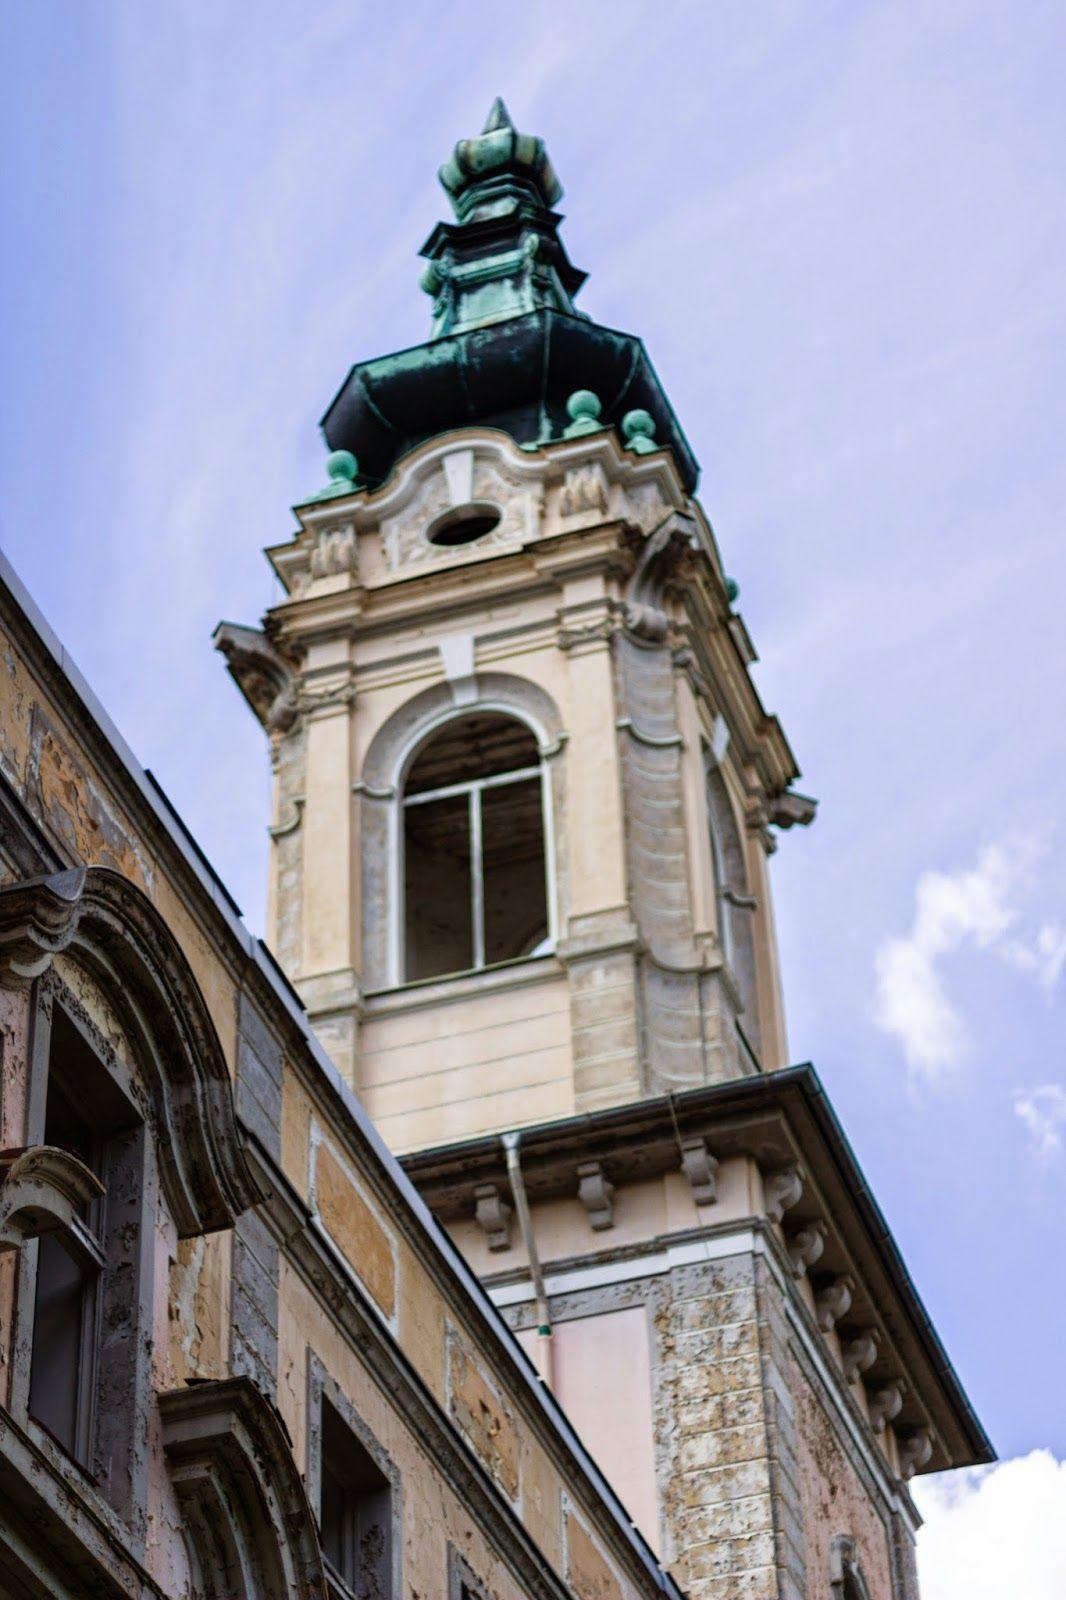 Schloss Dammsmühle: Rapunzel's Stasi castle – Abandoned Berlin